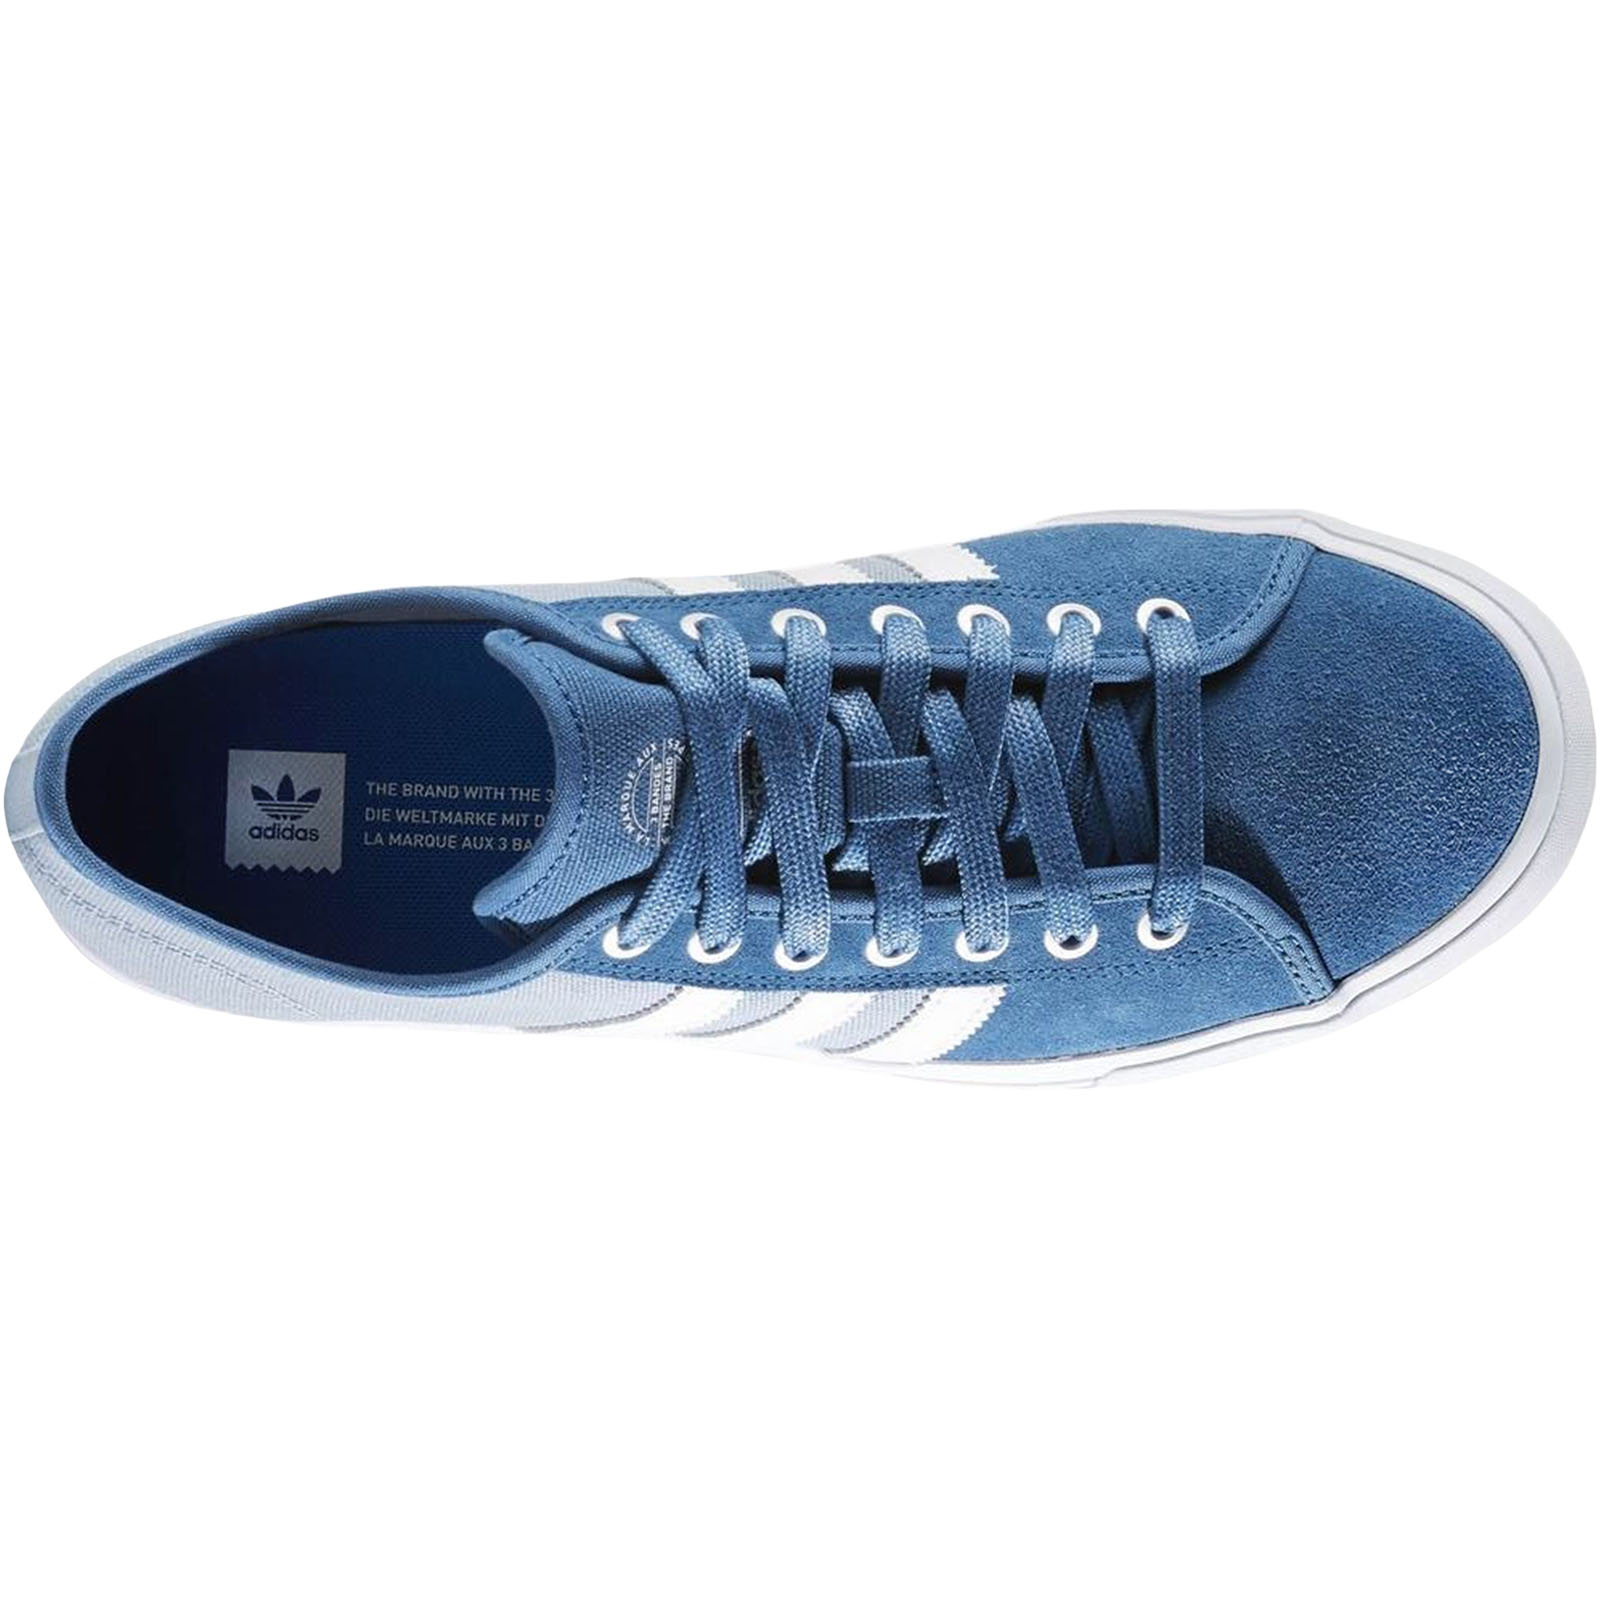 Adidas à Casual Remix Baskets Original Mode Matchcourt lacets qfwFxqYr